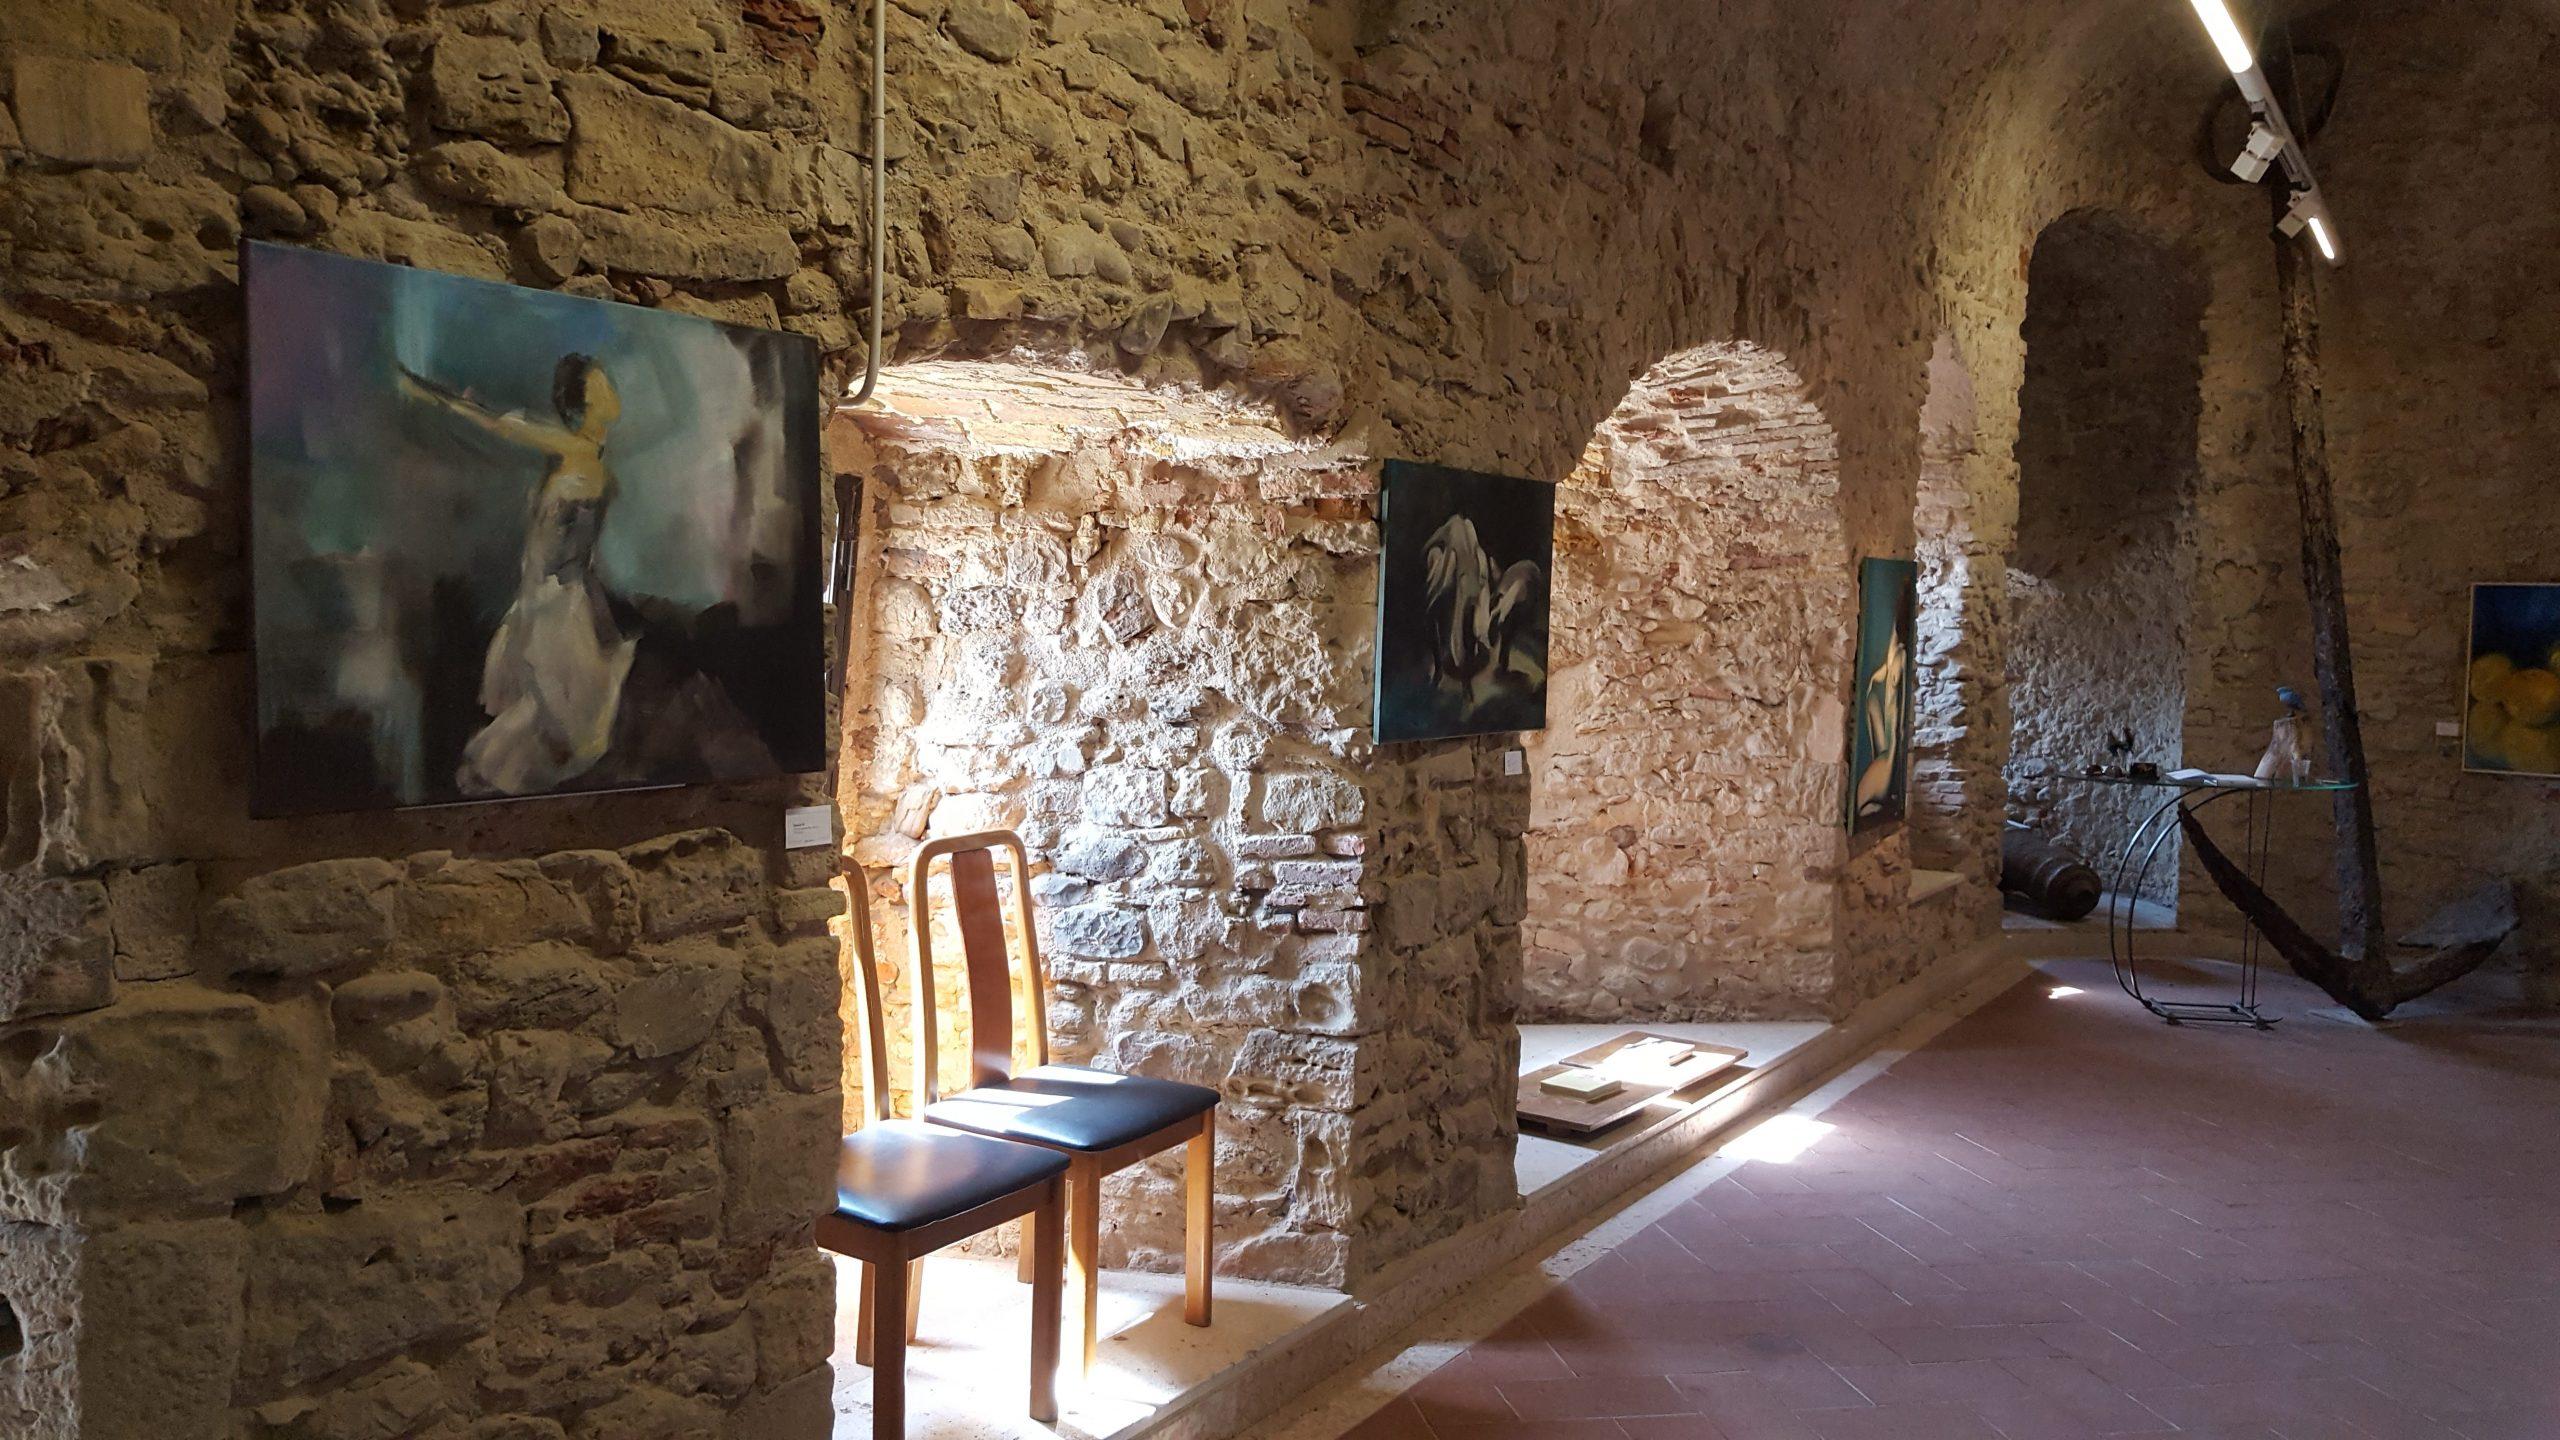 Impression of my exposition in Castello Svevo Termoli, Italy 2016